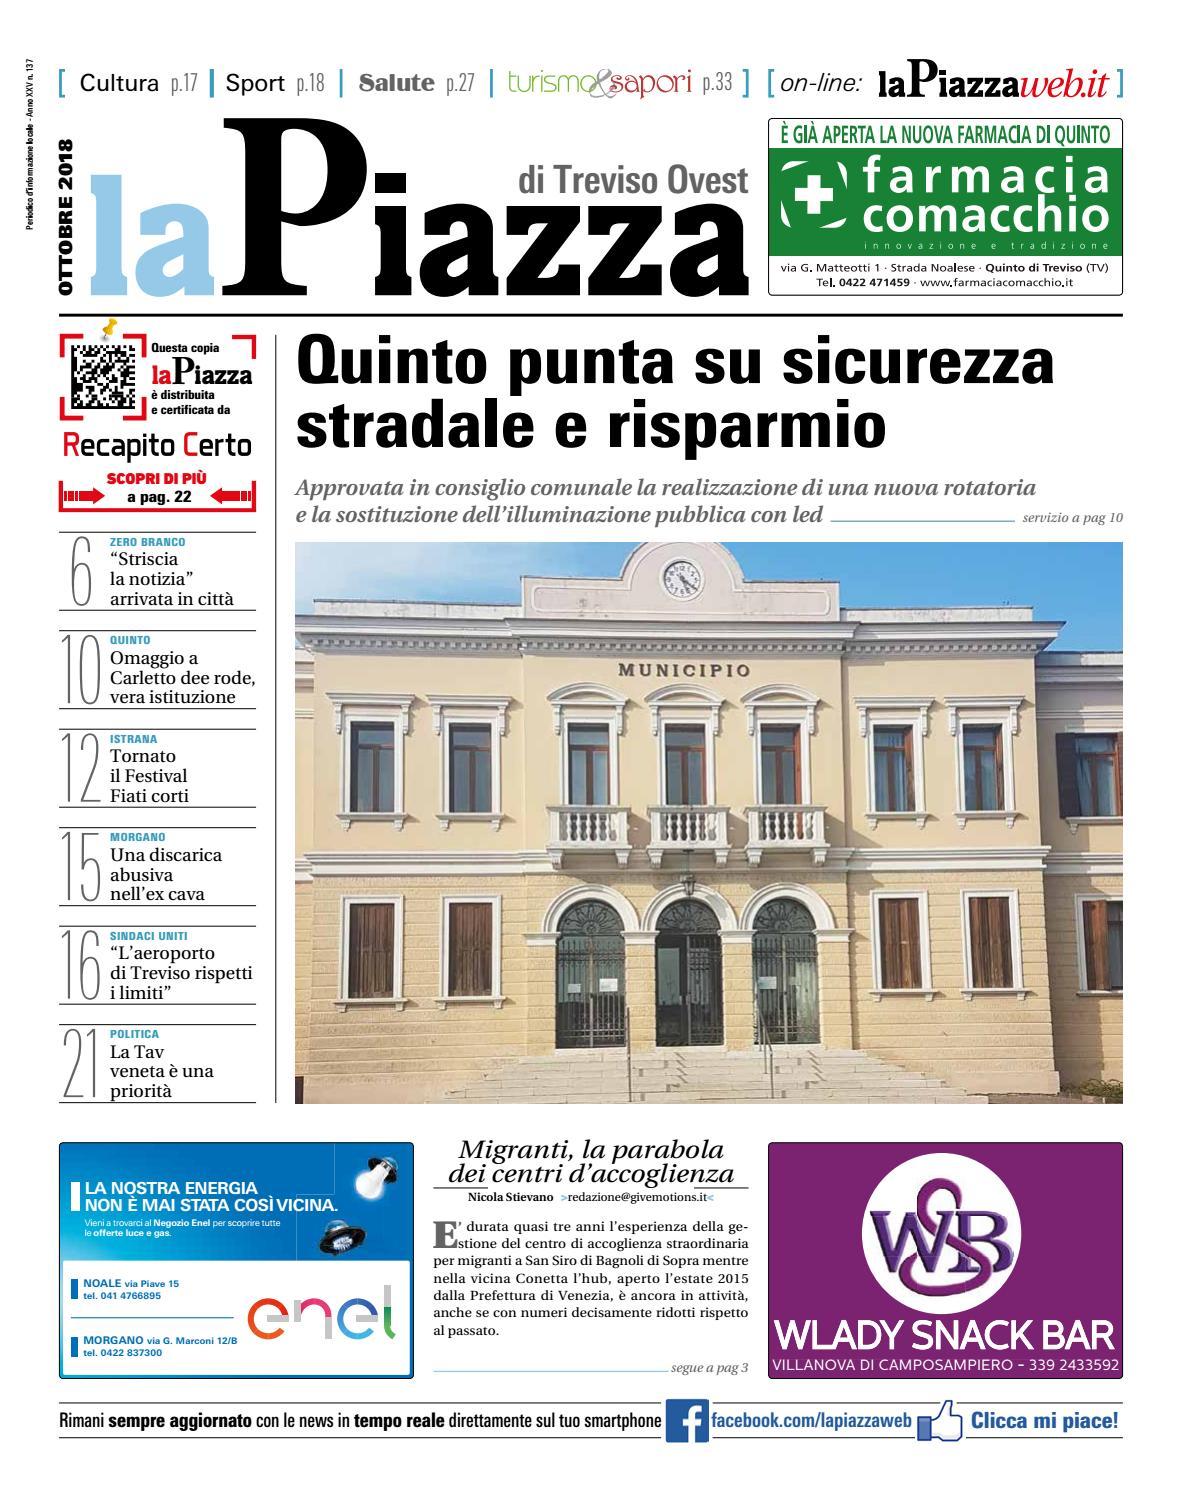 La Piazza di Treviso ovest ott2018 n137 by lapiazza give emotions - issuu 810c2b9b7703